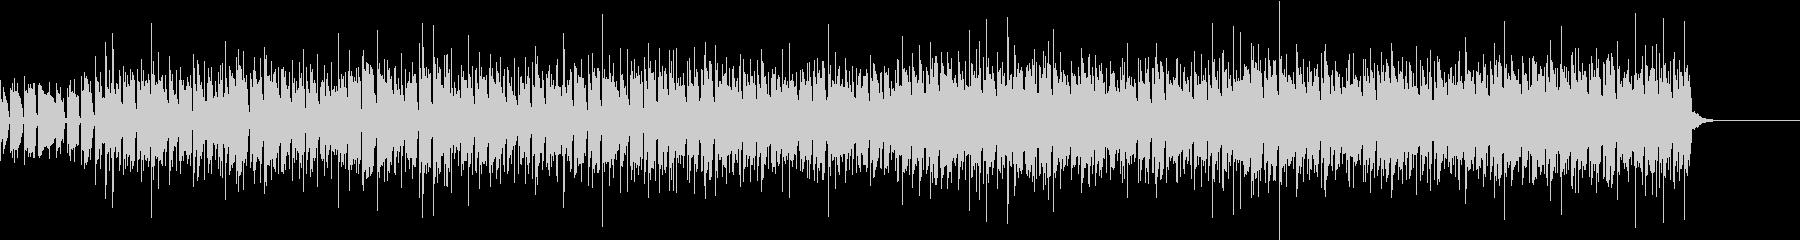 BassとGtのR&Bなセッション風の未再生の波形